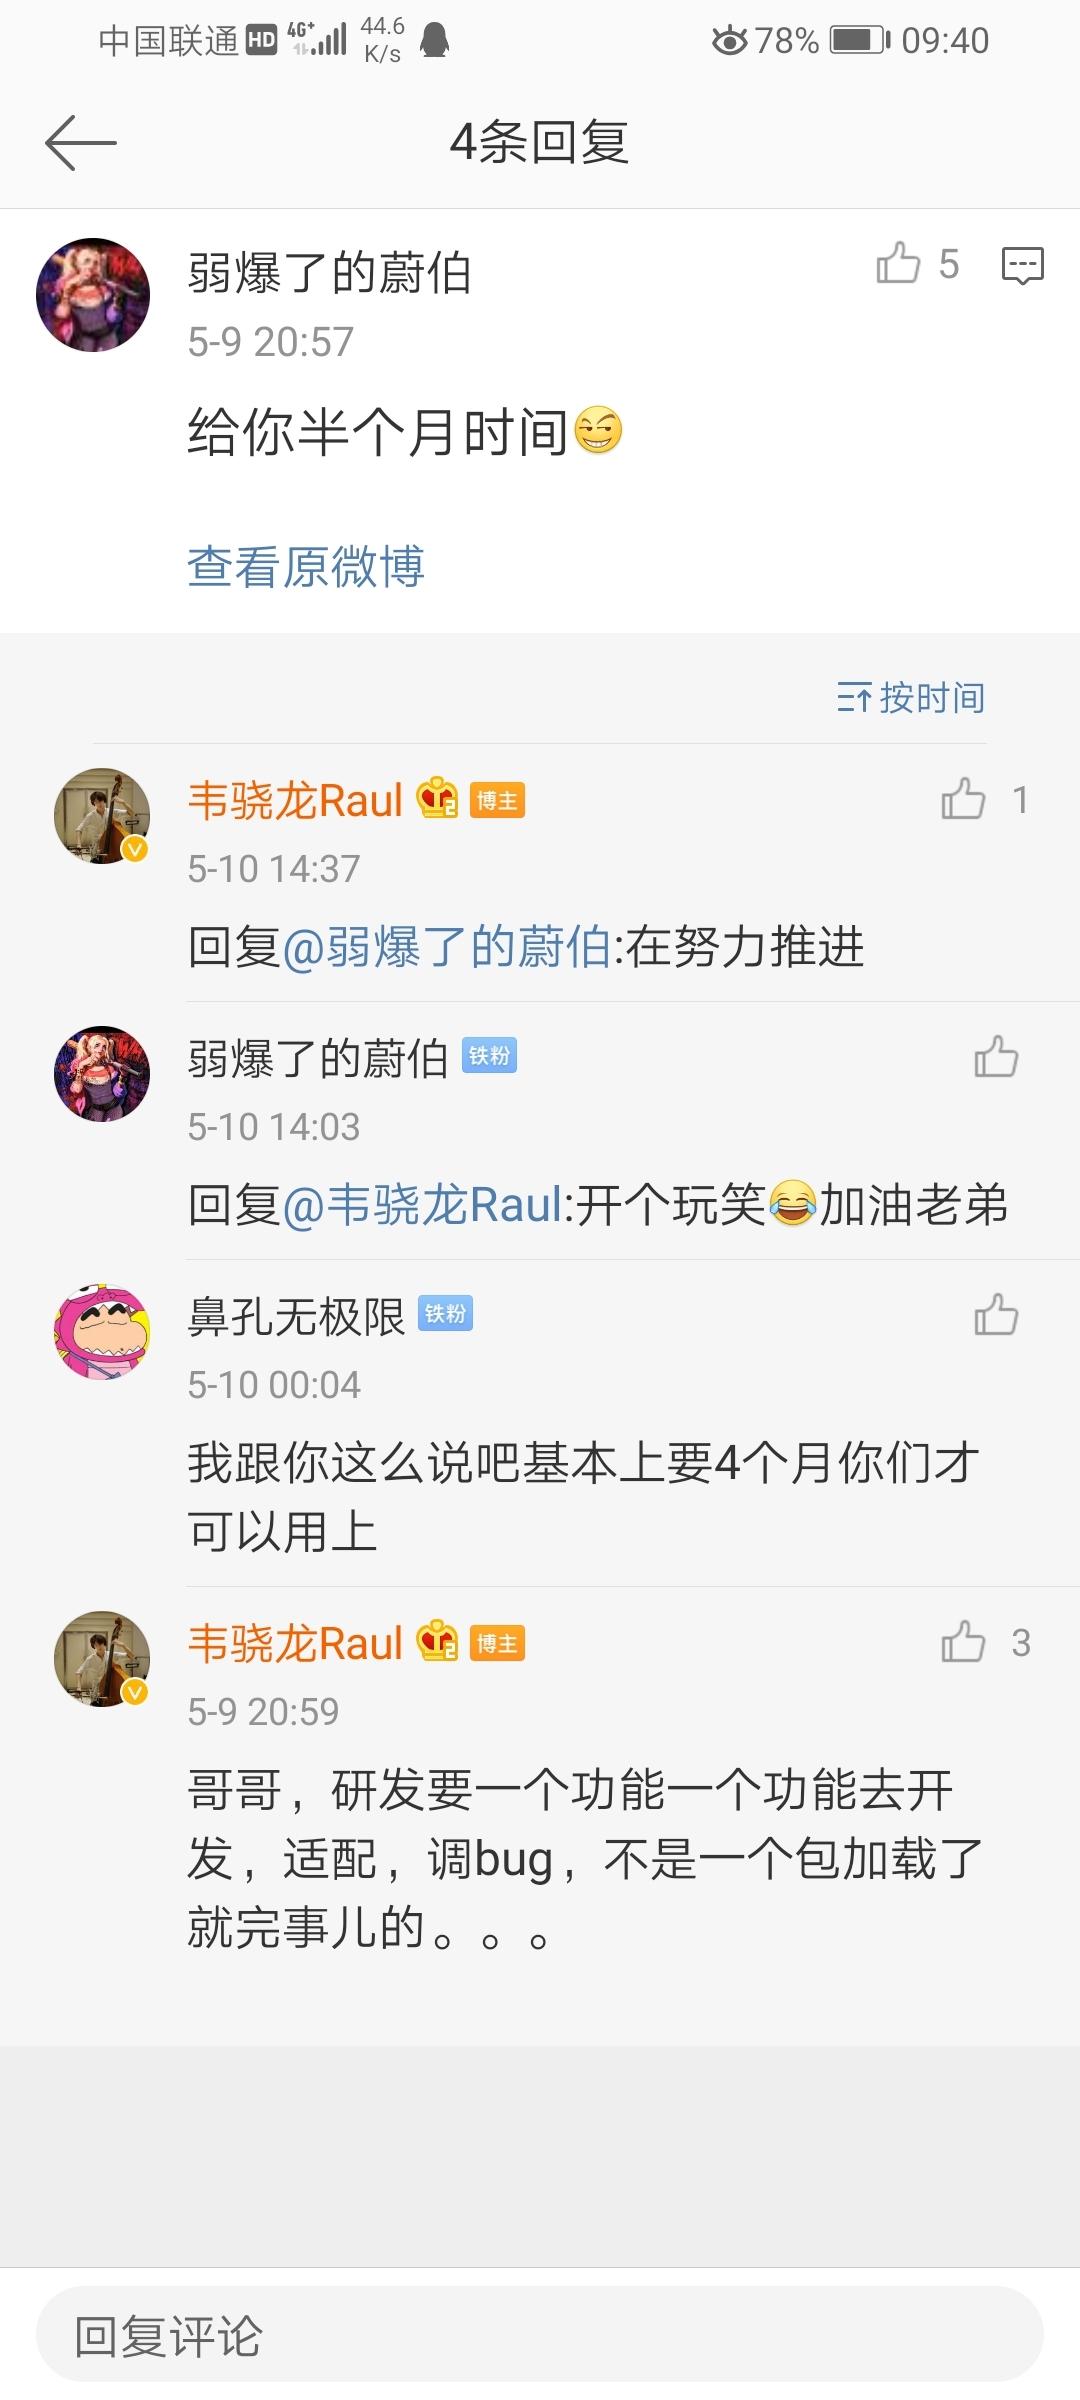 Screenshot_20200518_094041_com.sina.weibo.jpg